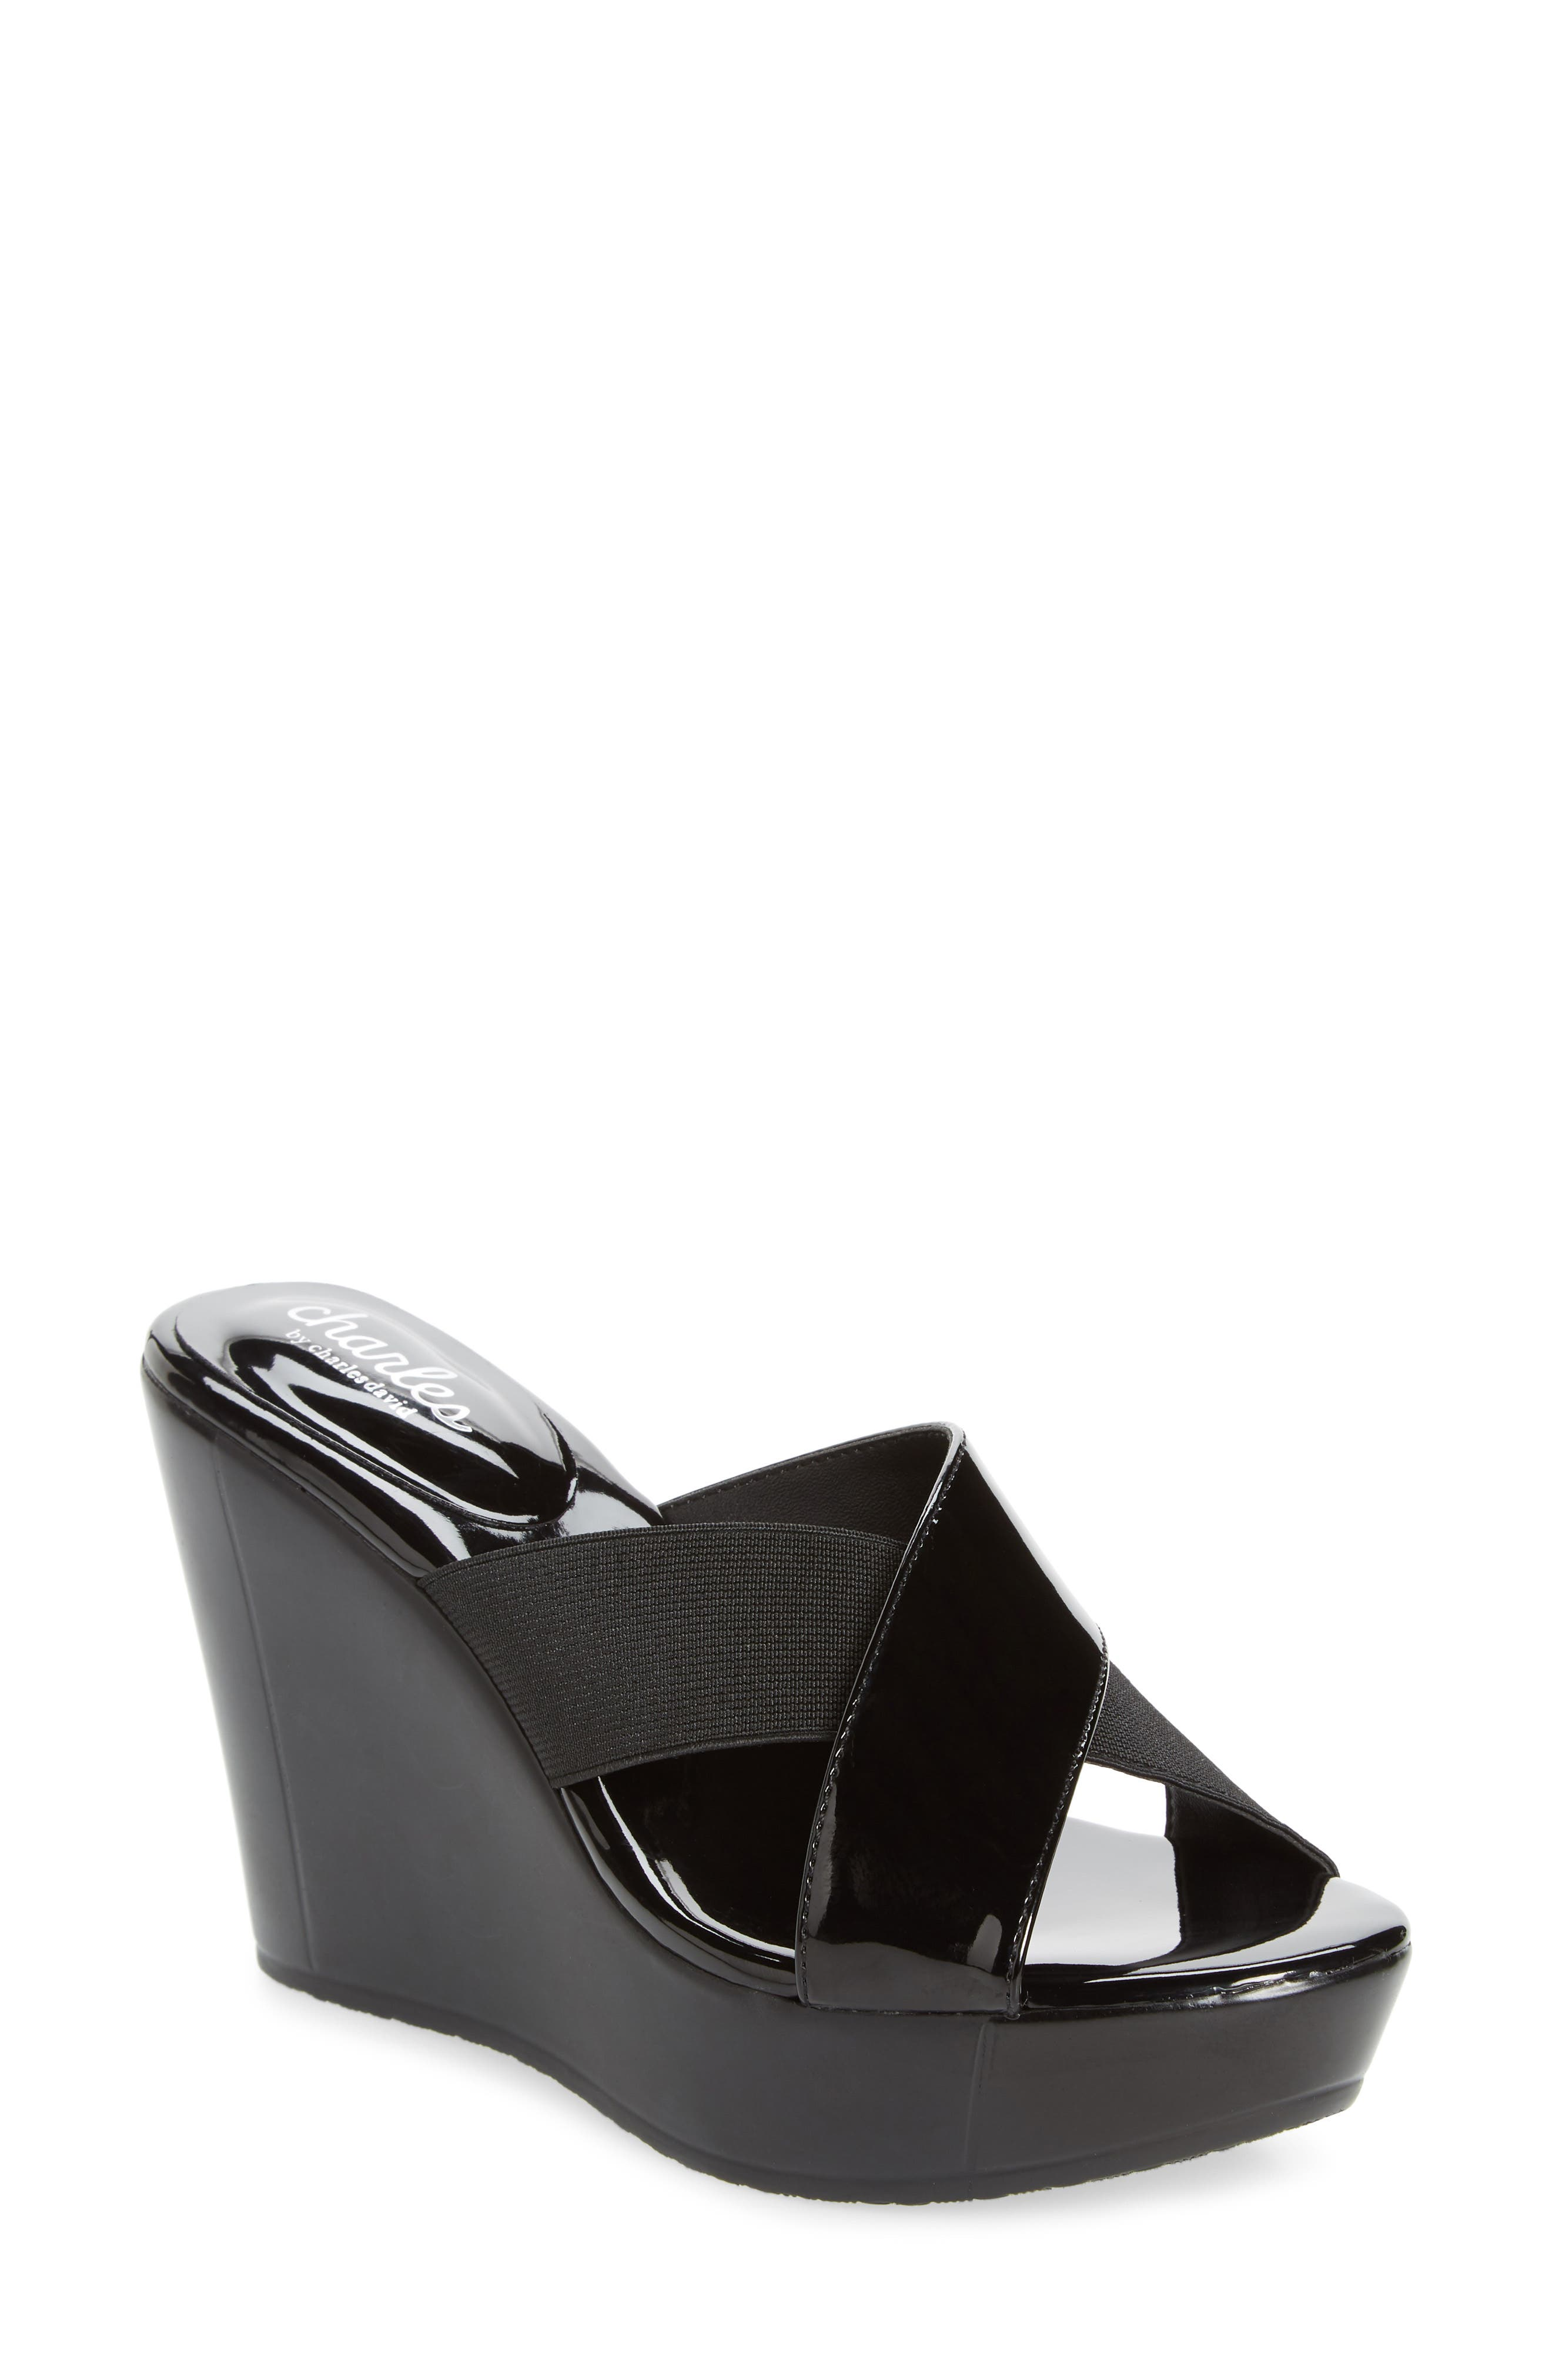 CHARLES BY CHARLES DAVID Fuzho Platform Wedge Sandal, Main, color, BLACK FABRIC/ FAUX PATENT